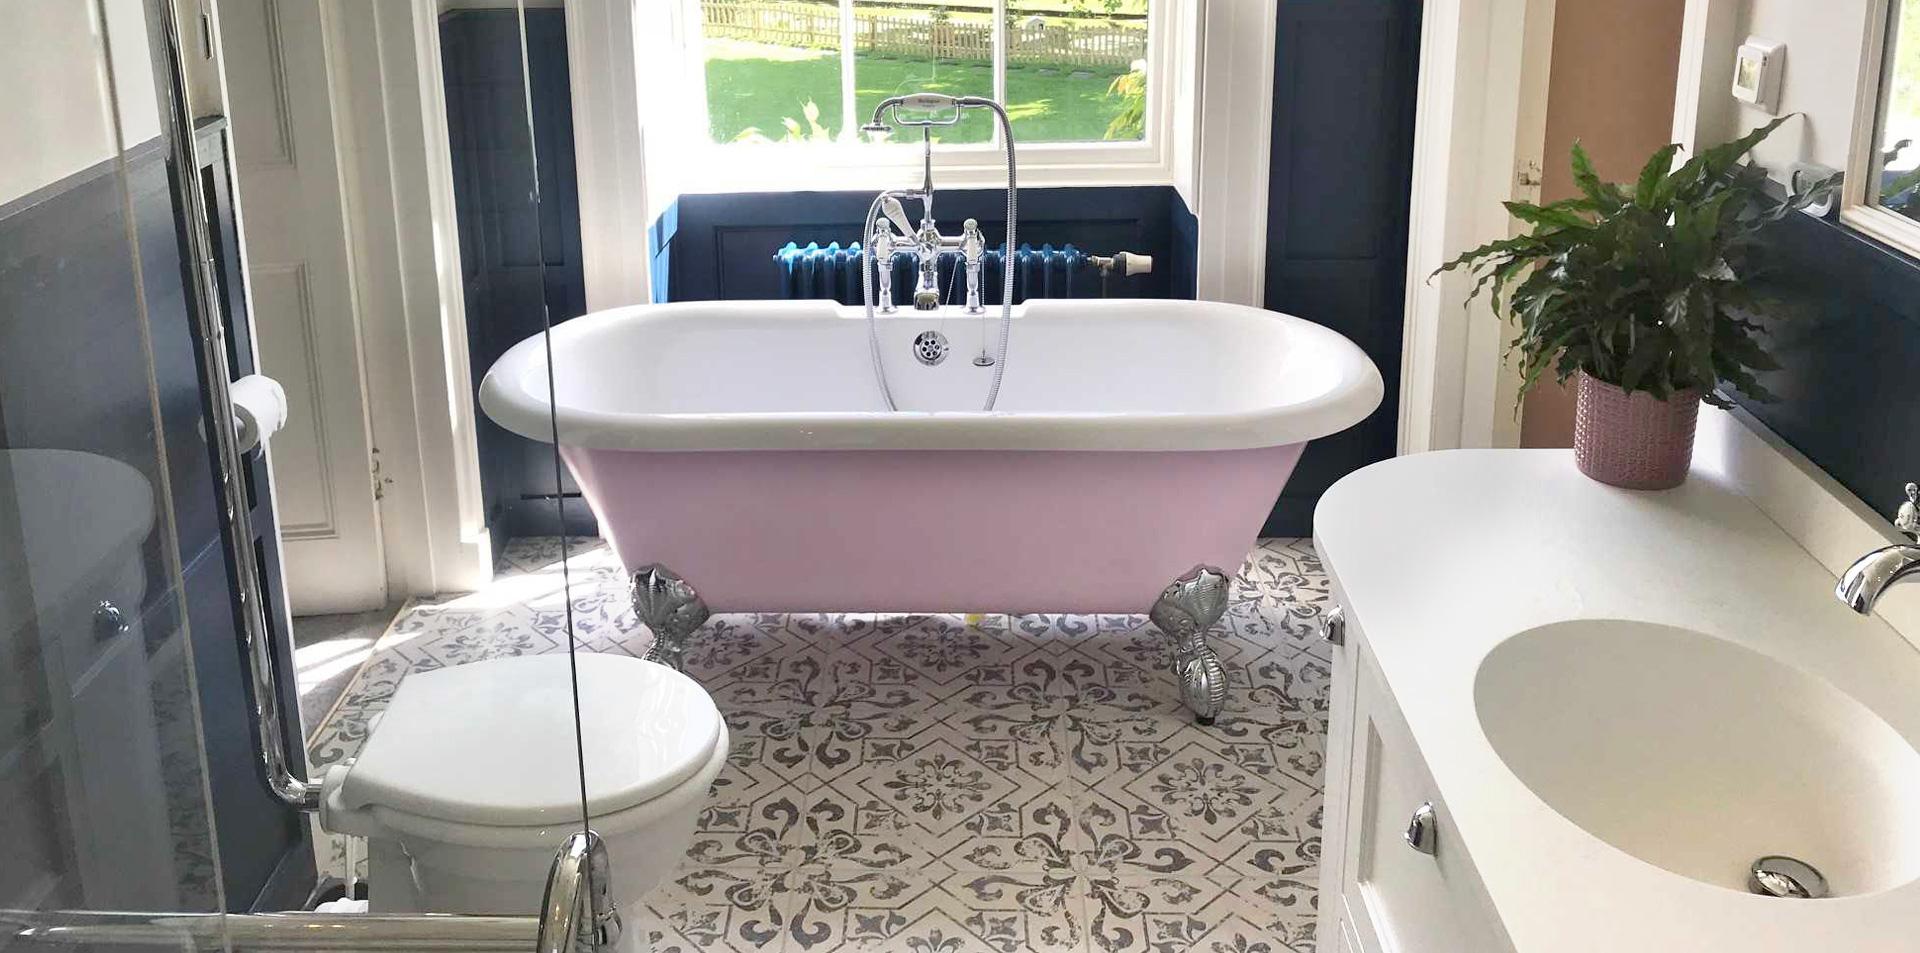 Plumbing_Solutions_Plus_Bathrooms-East_Brent